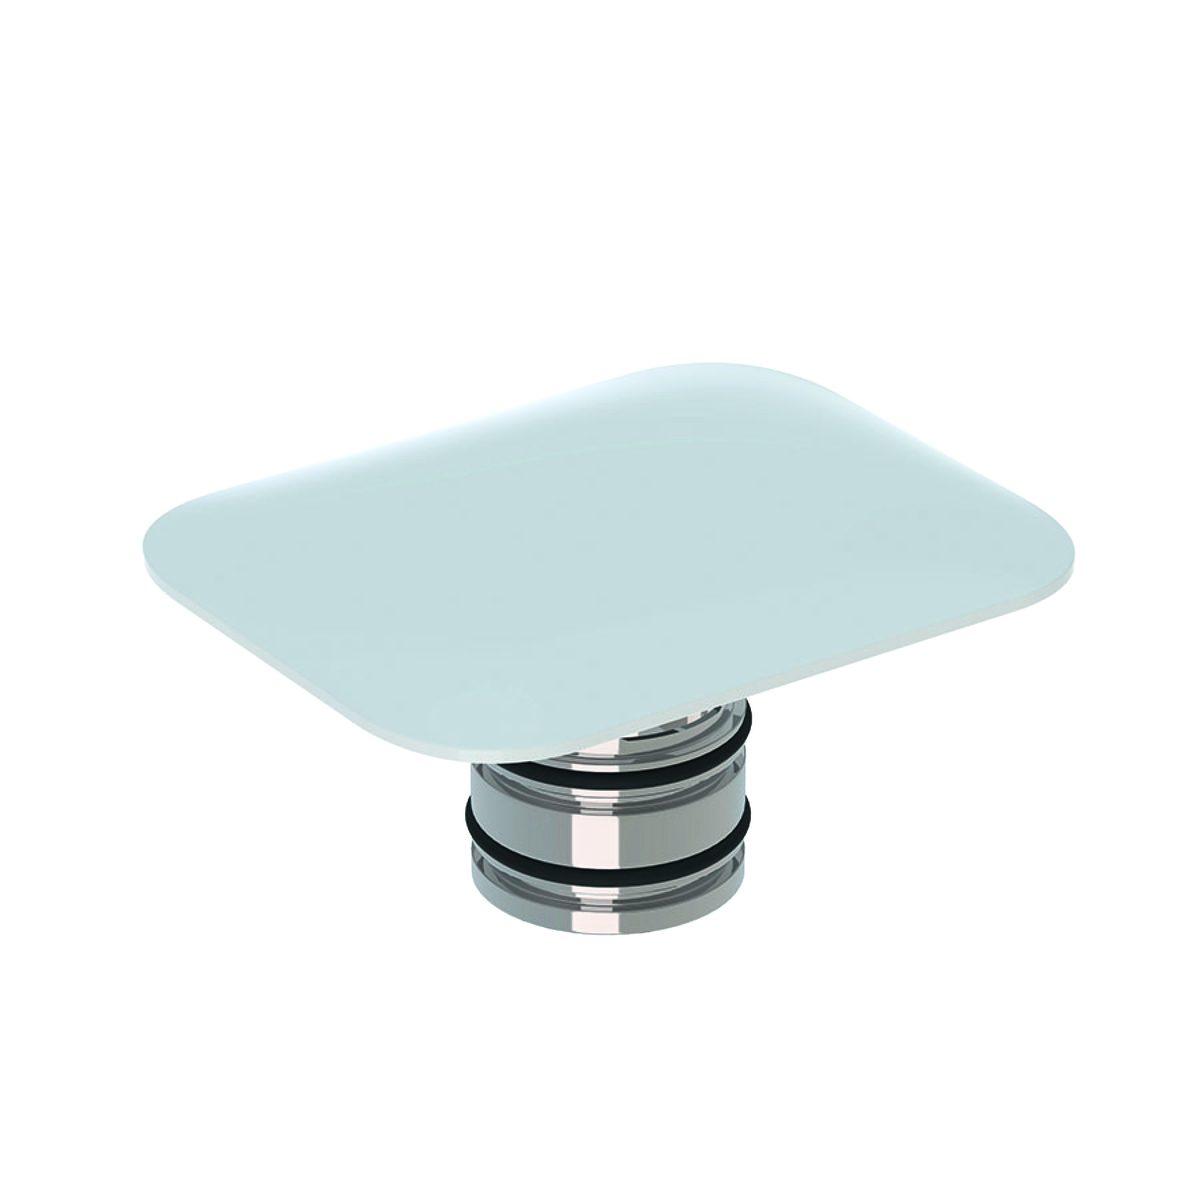 Capac ceramic cu ventil de scurgere Geberit myDay alb poza